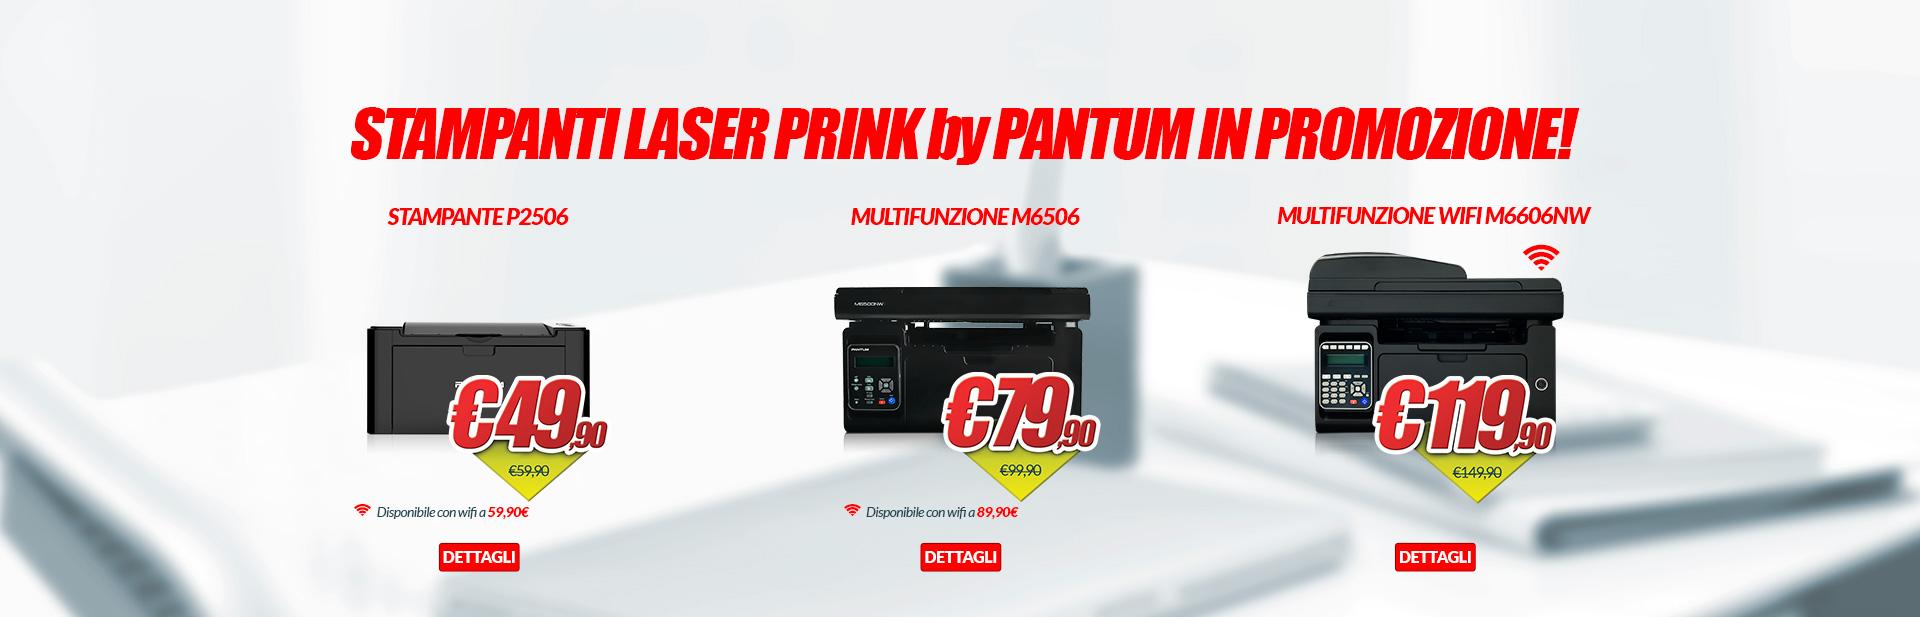 stampanti-laser-prink-by-pantum-in-promozione-SL